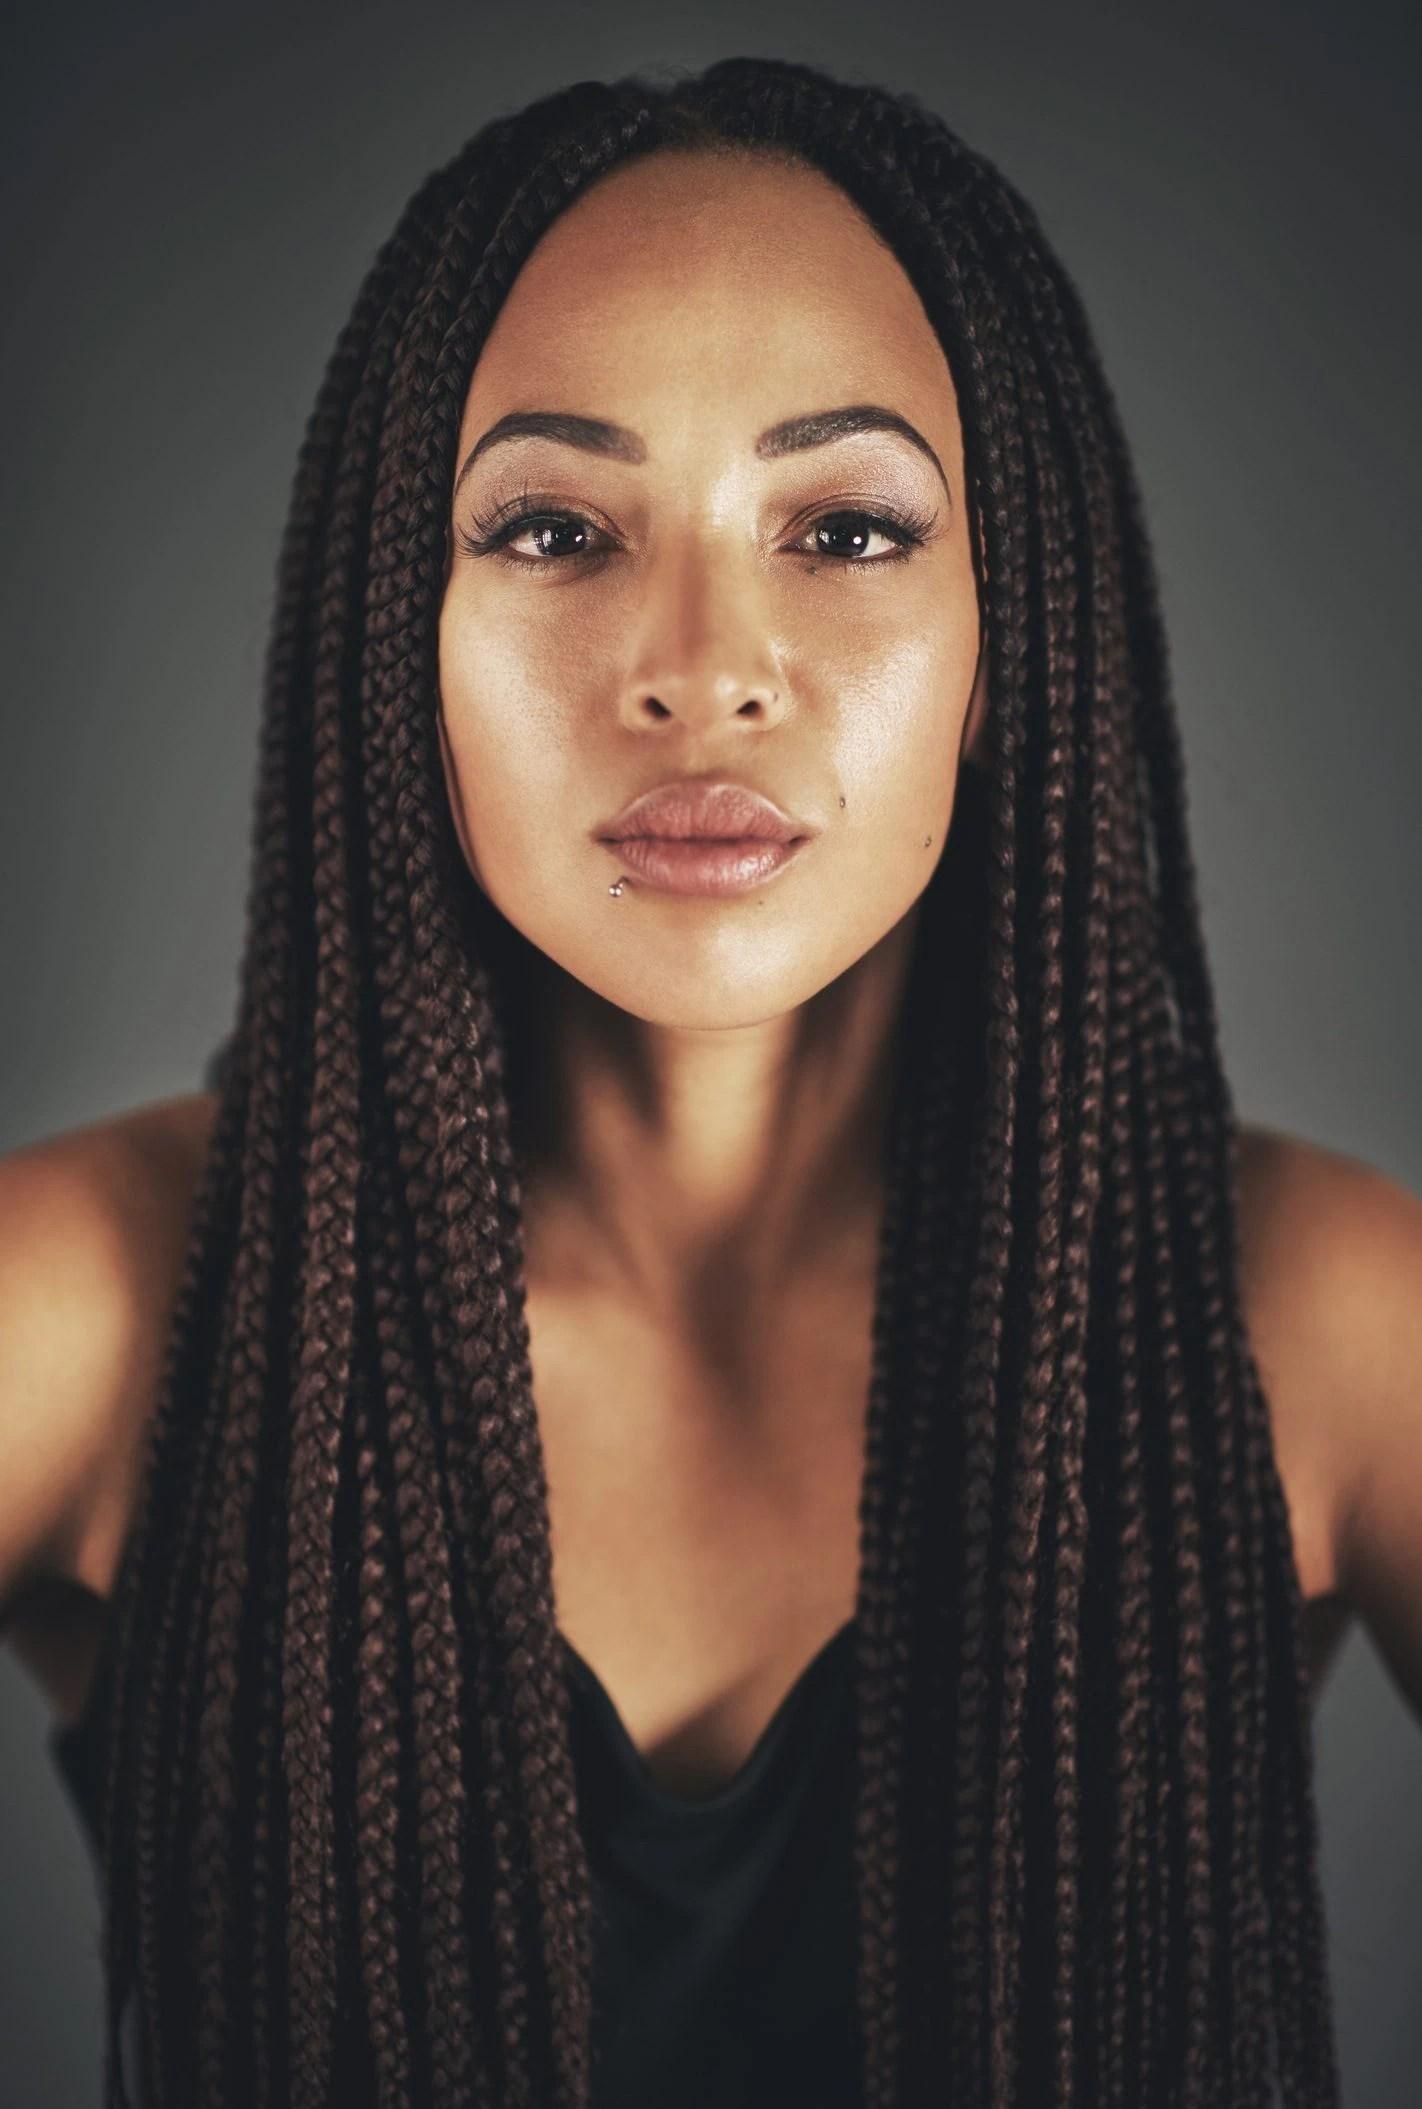 black hairstyles braids with hair down